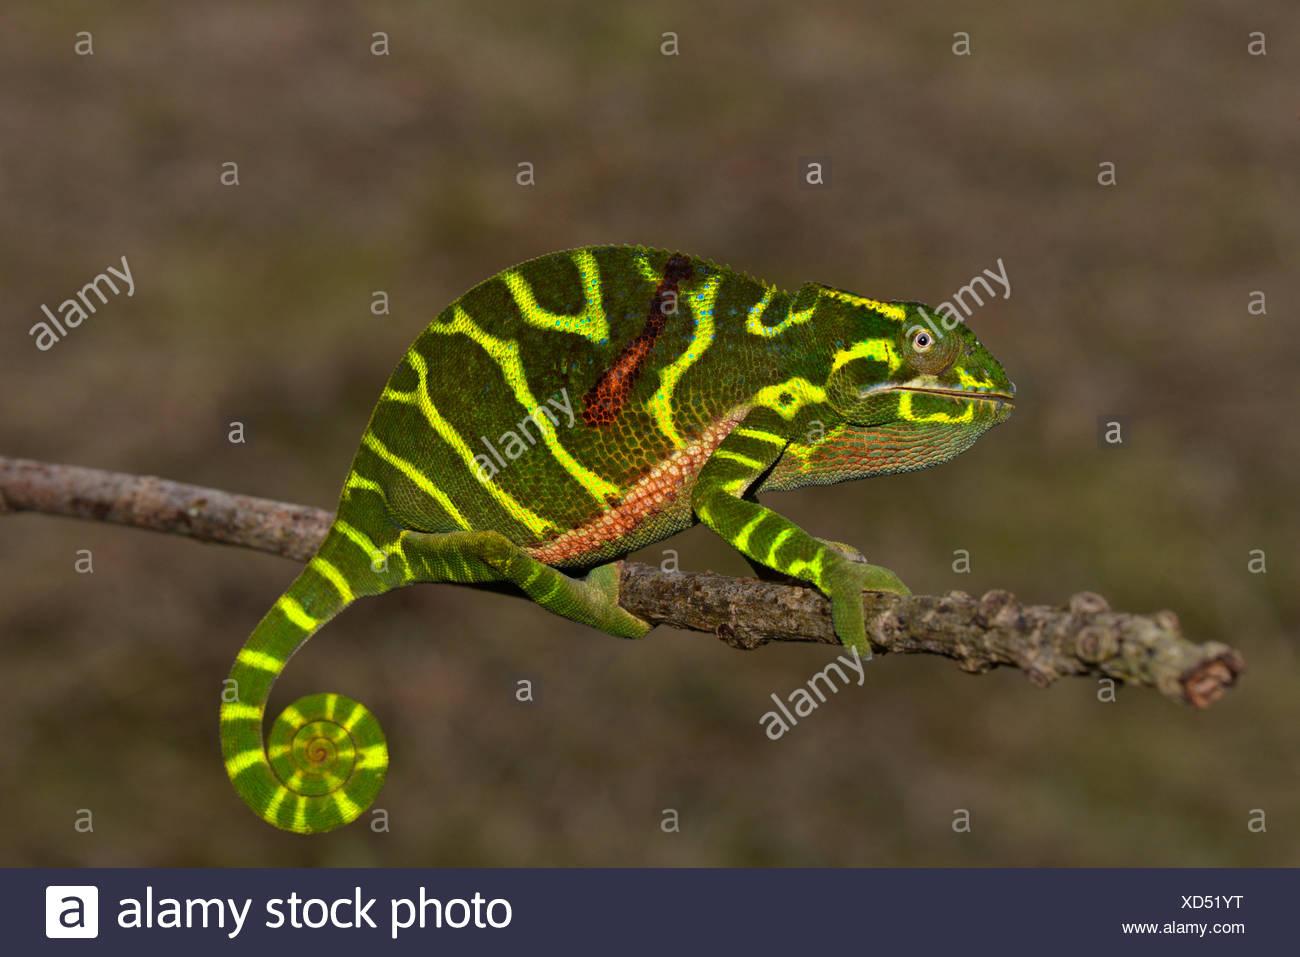 Chameleon del neo scoperto specie Furcifer timoni, femmina, Montagne d'Ambre, Madagascar Immagini Stock